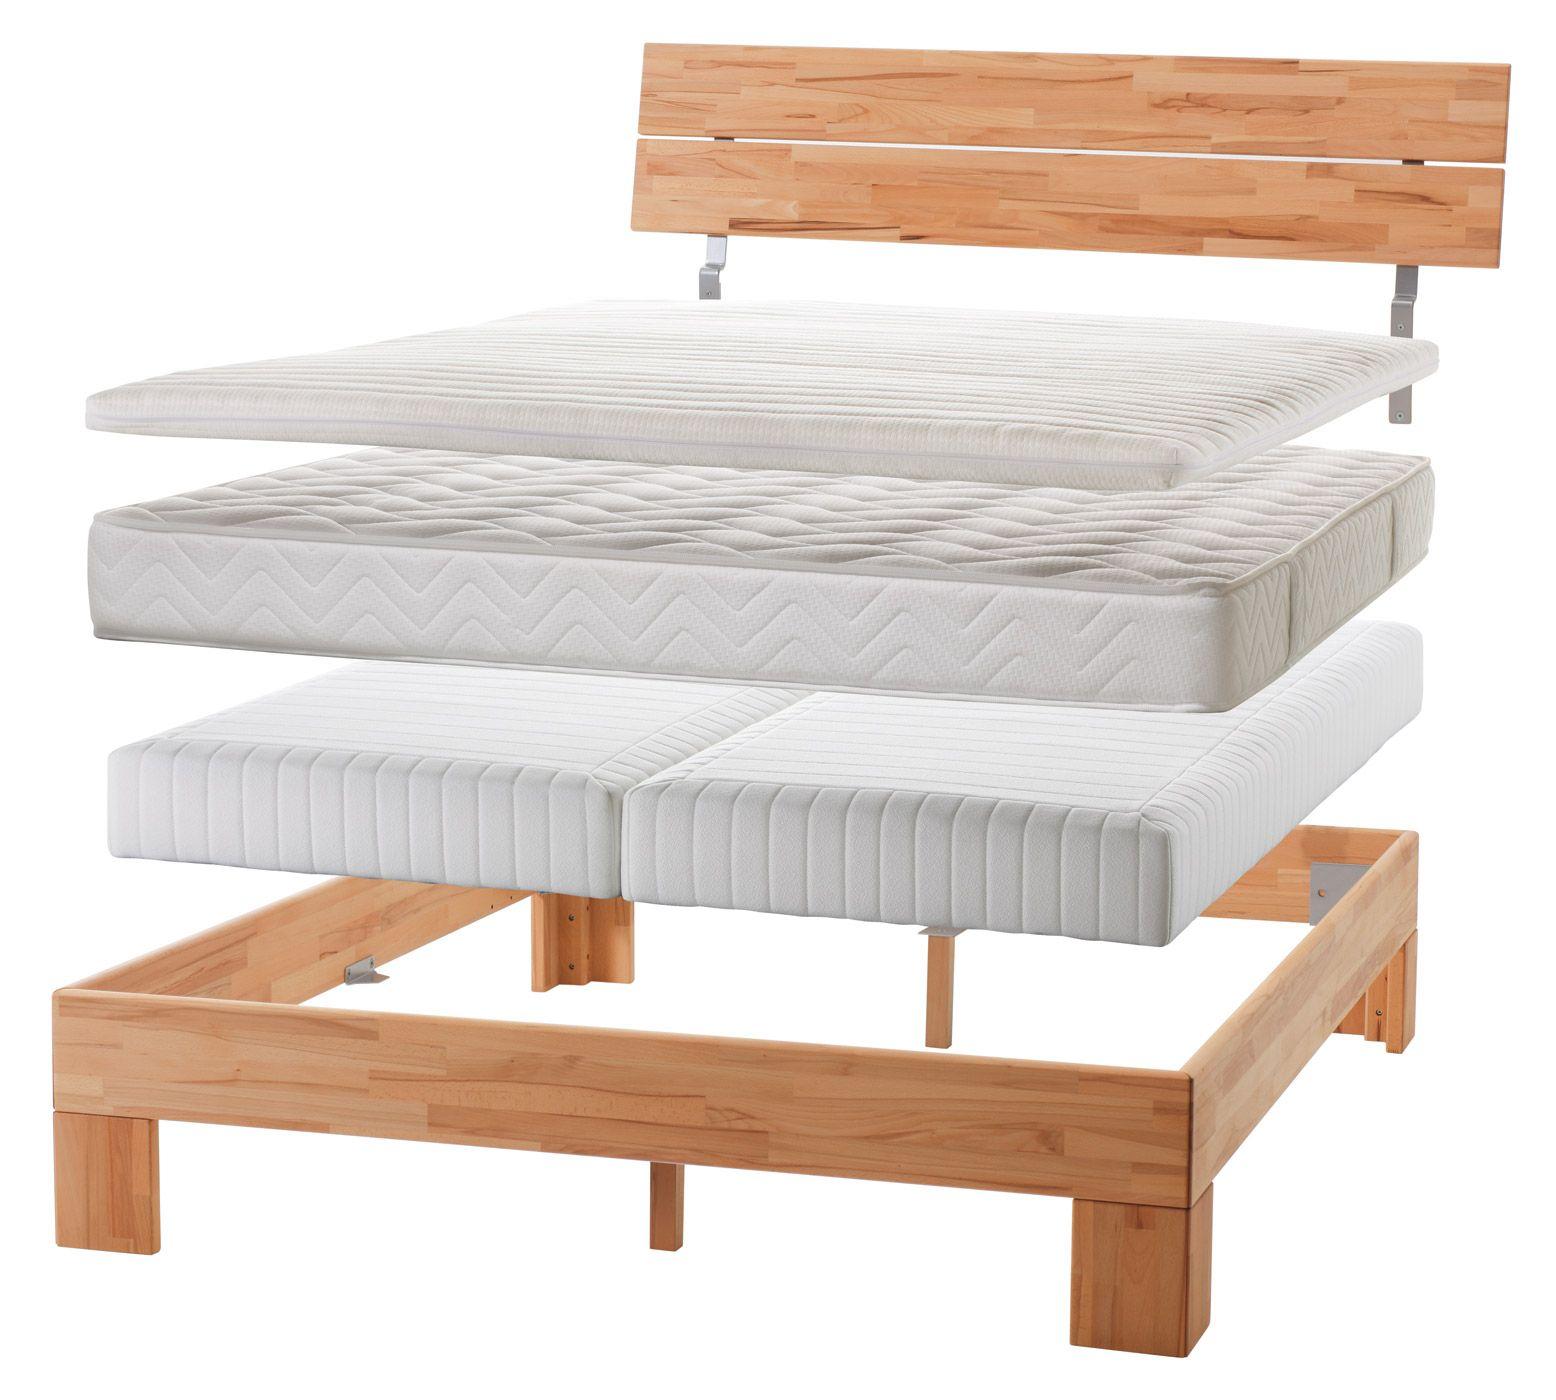 boxspring einlege system kingston in 2019. Black Bedroom Furniture Sets. Home Design Ideas